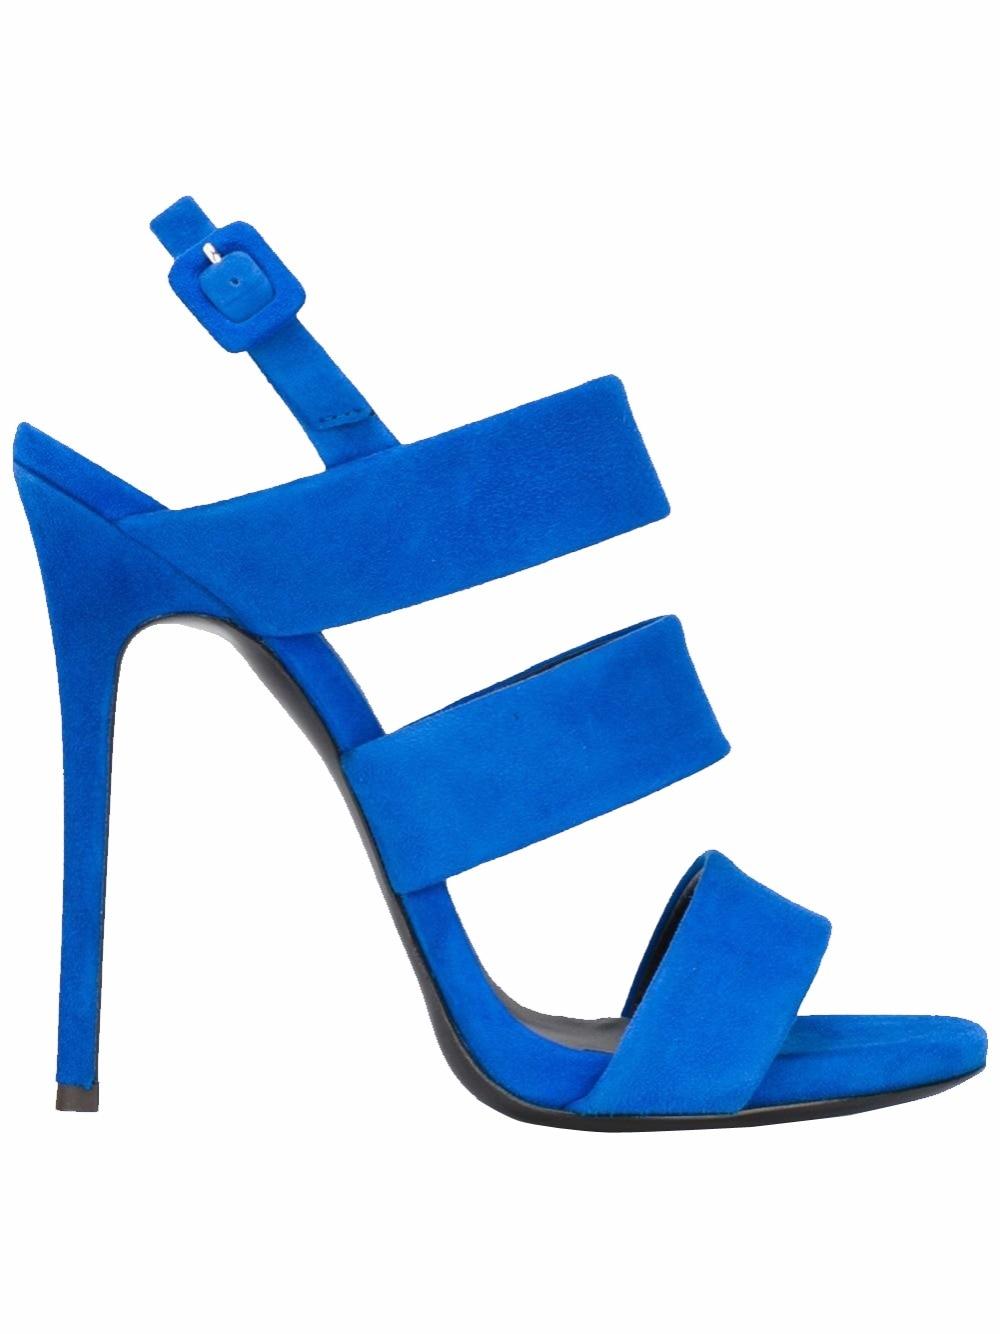 Womens Handmade Slingback Sandals 12cm High Heel Party Dress Shoes CKE154